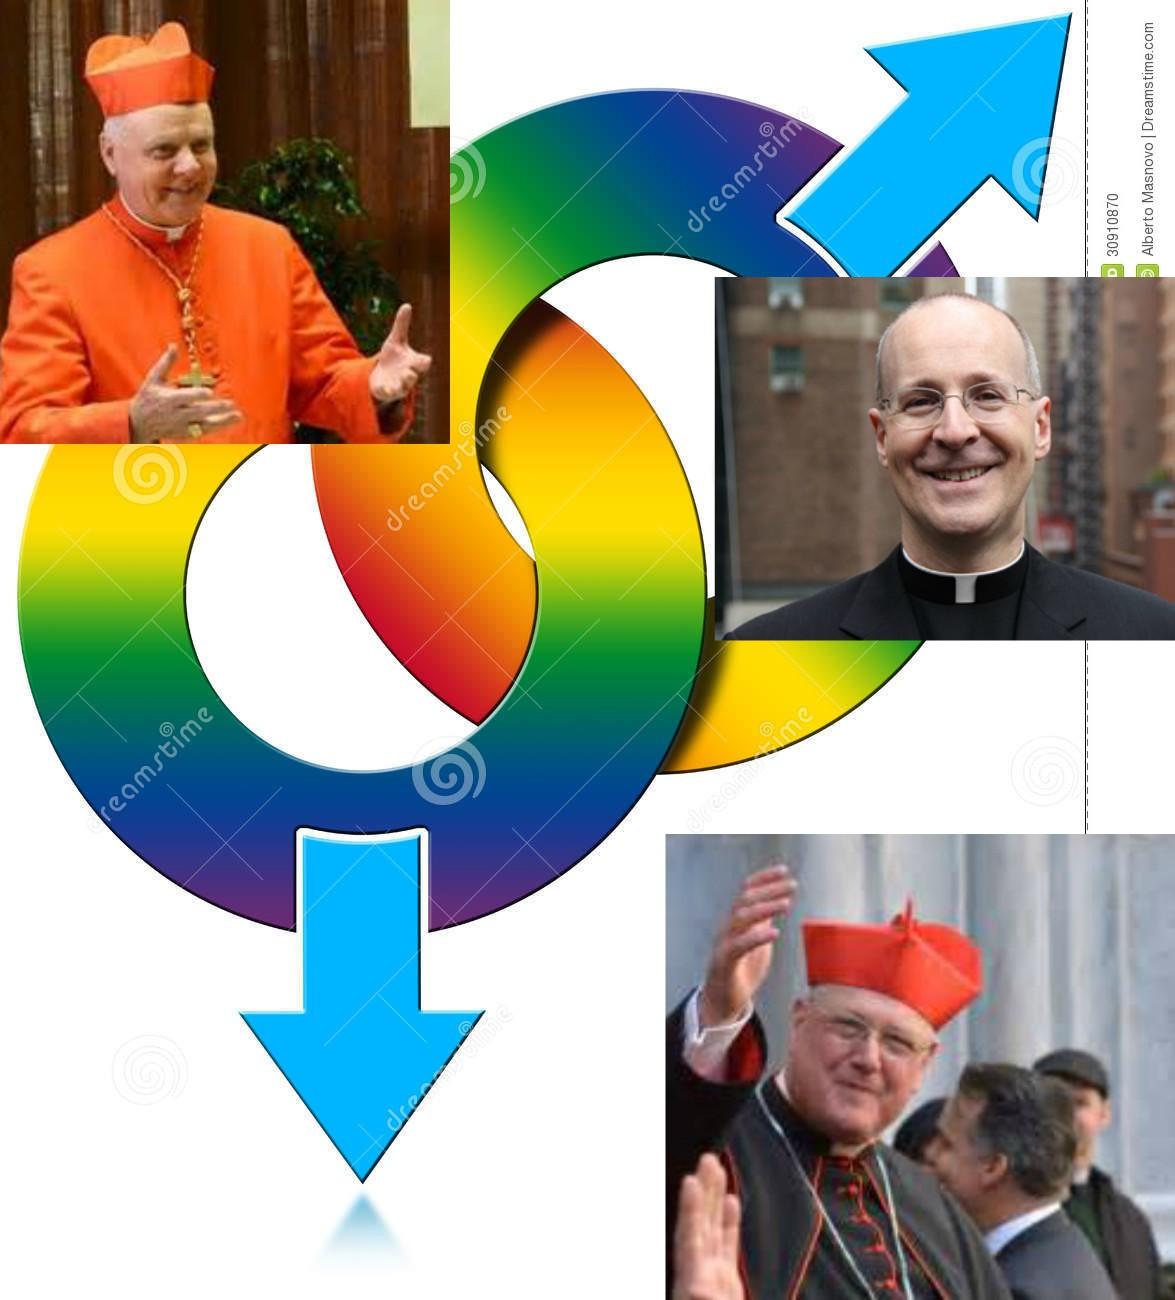 Illuminati agenda homosexuality statistics